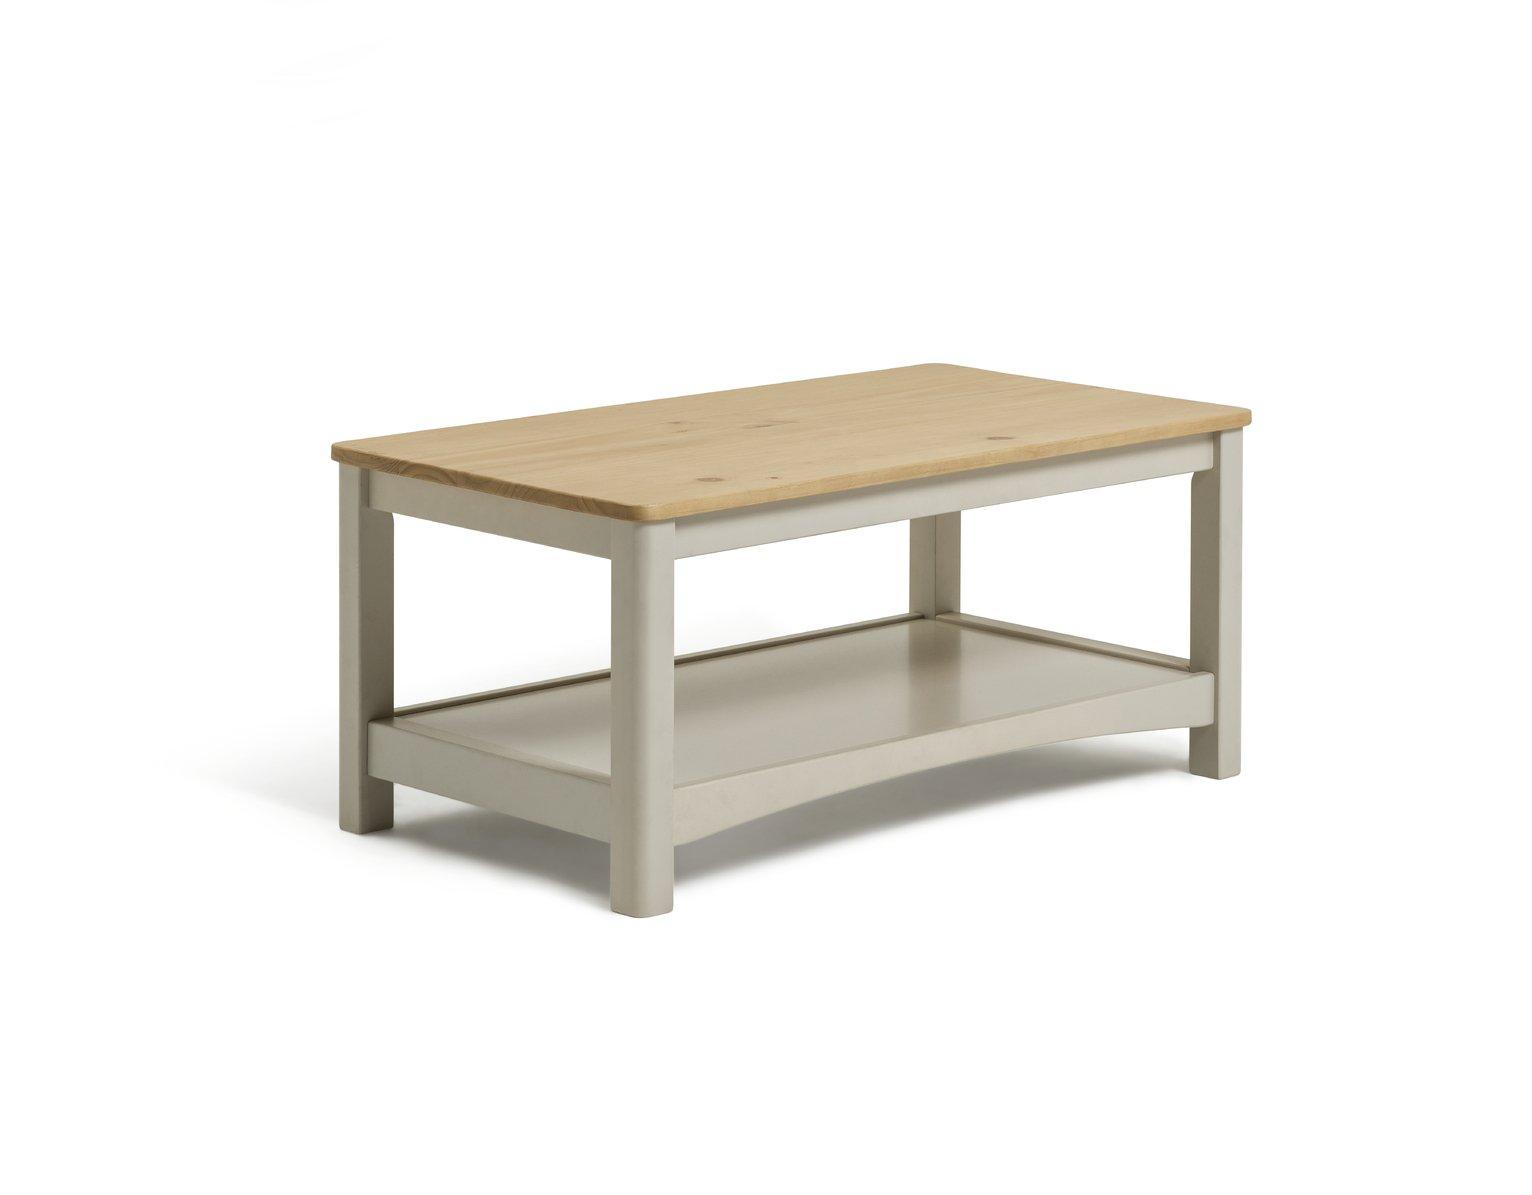 Argos Home Bournemouth Coffee Table - Light Grey